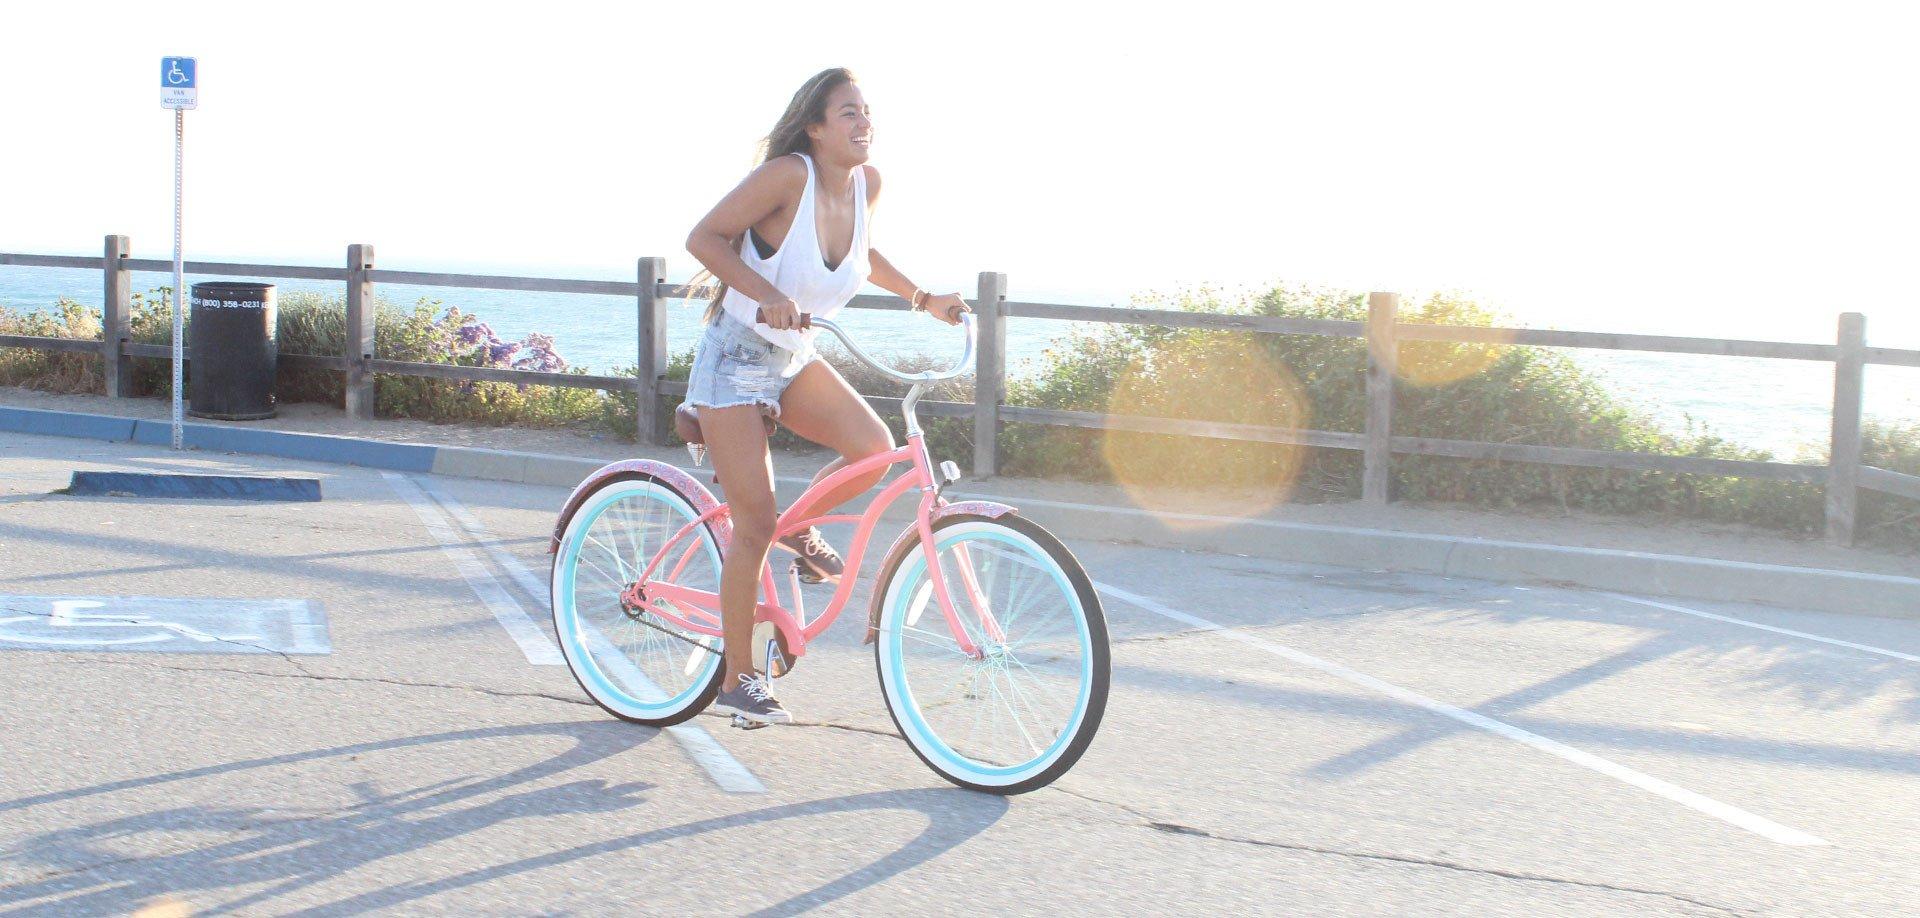 Ljepotice i bicikli - Page 11 Dynamic-banner-womens-paisley_36a4d5fd-1f0b-4d63-86fe-fbd32ec4e68e_2048x2048